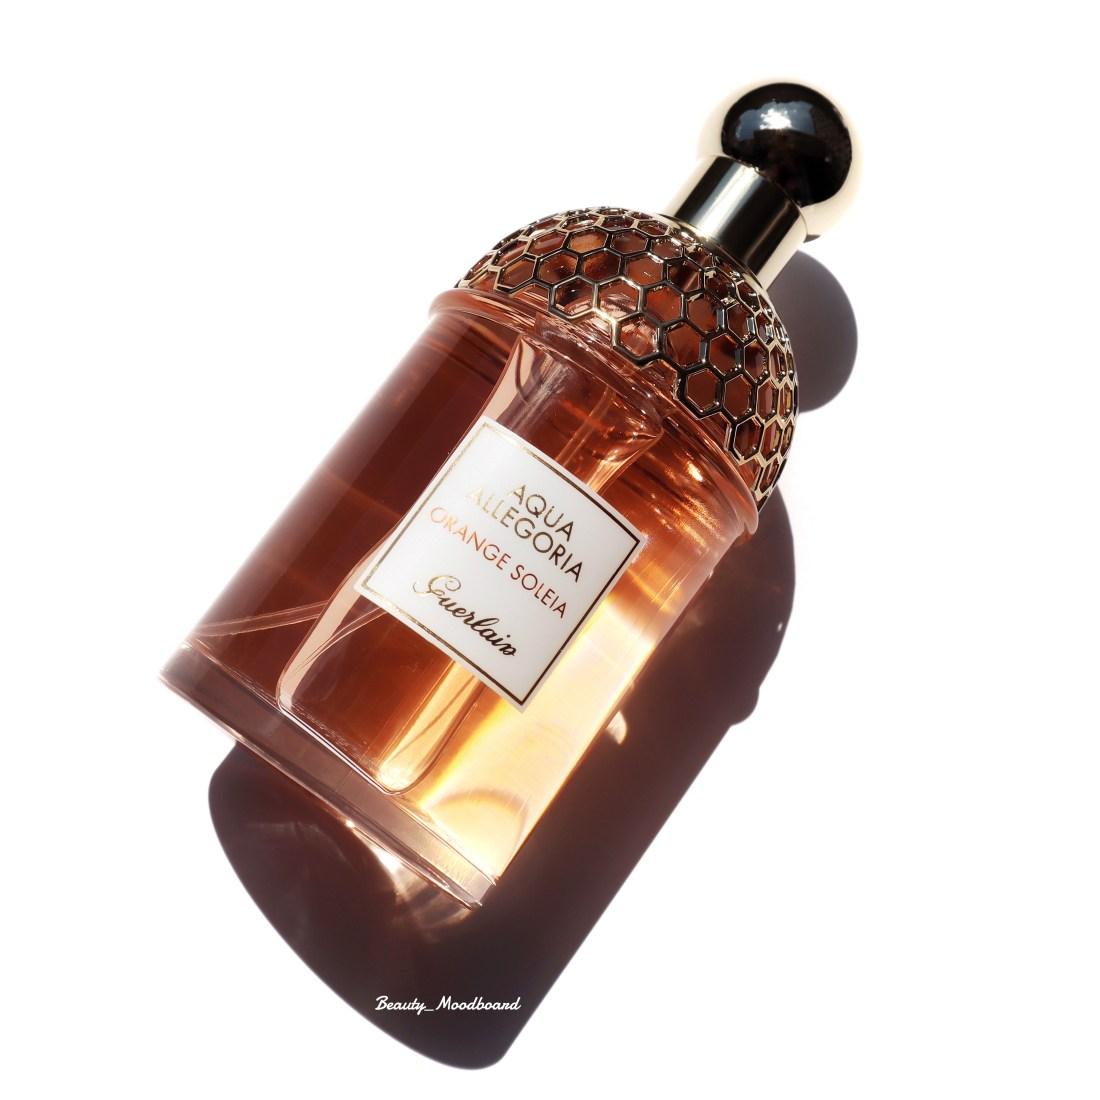 Nouveauté Parfum Guerlain Aqua Allegoria Orange Soleia